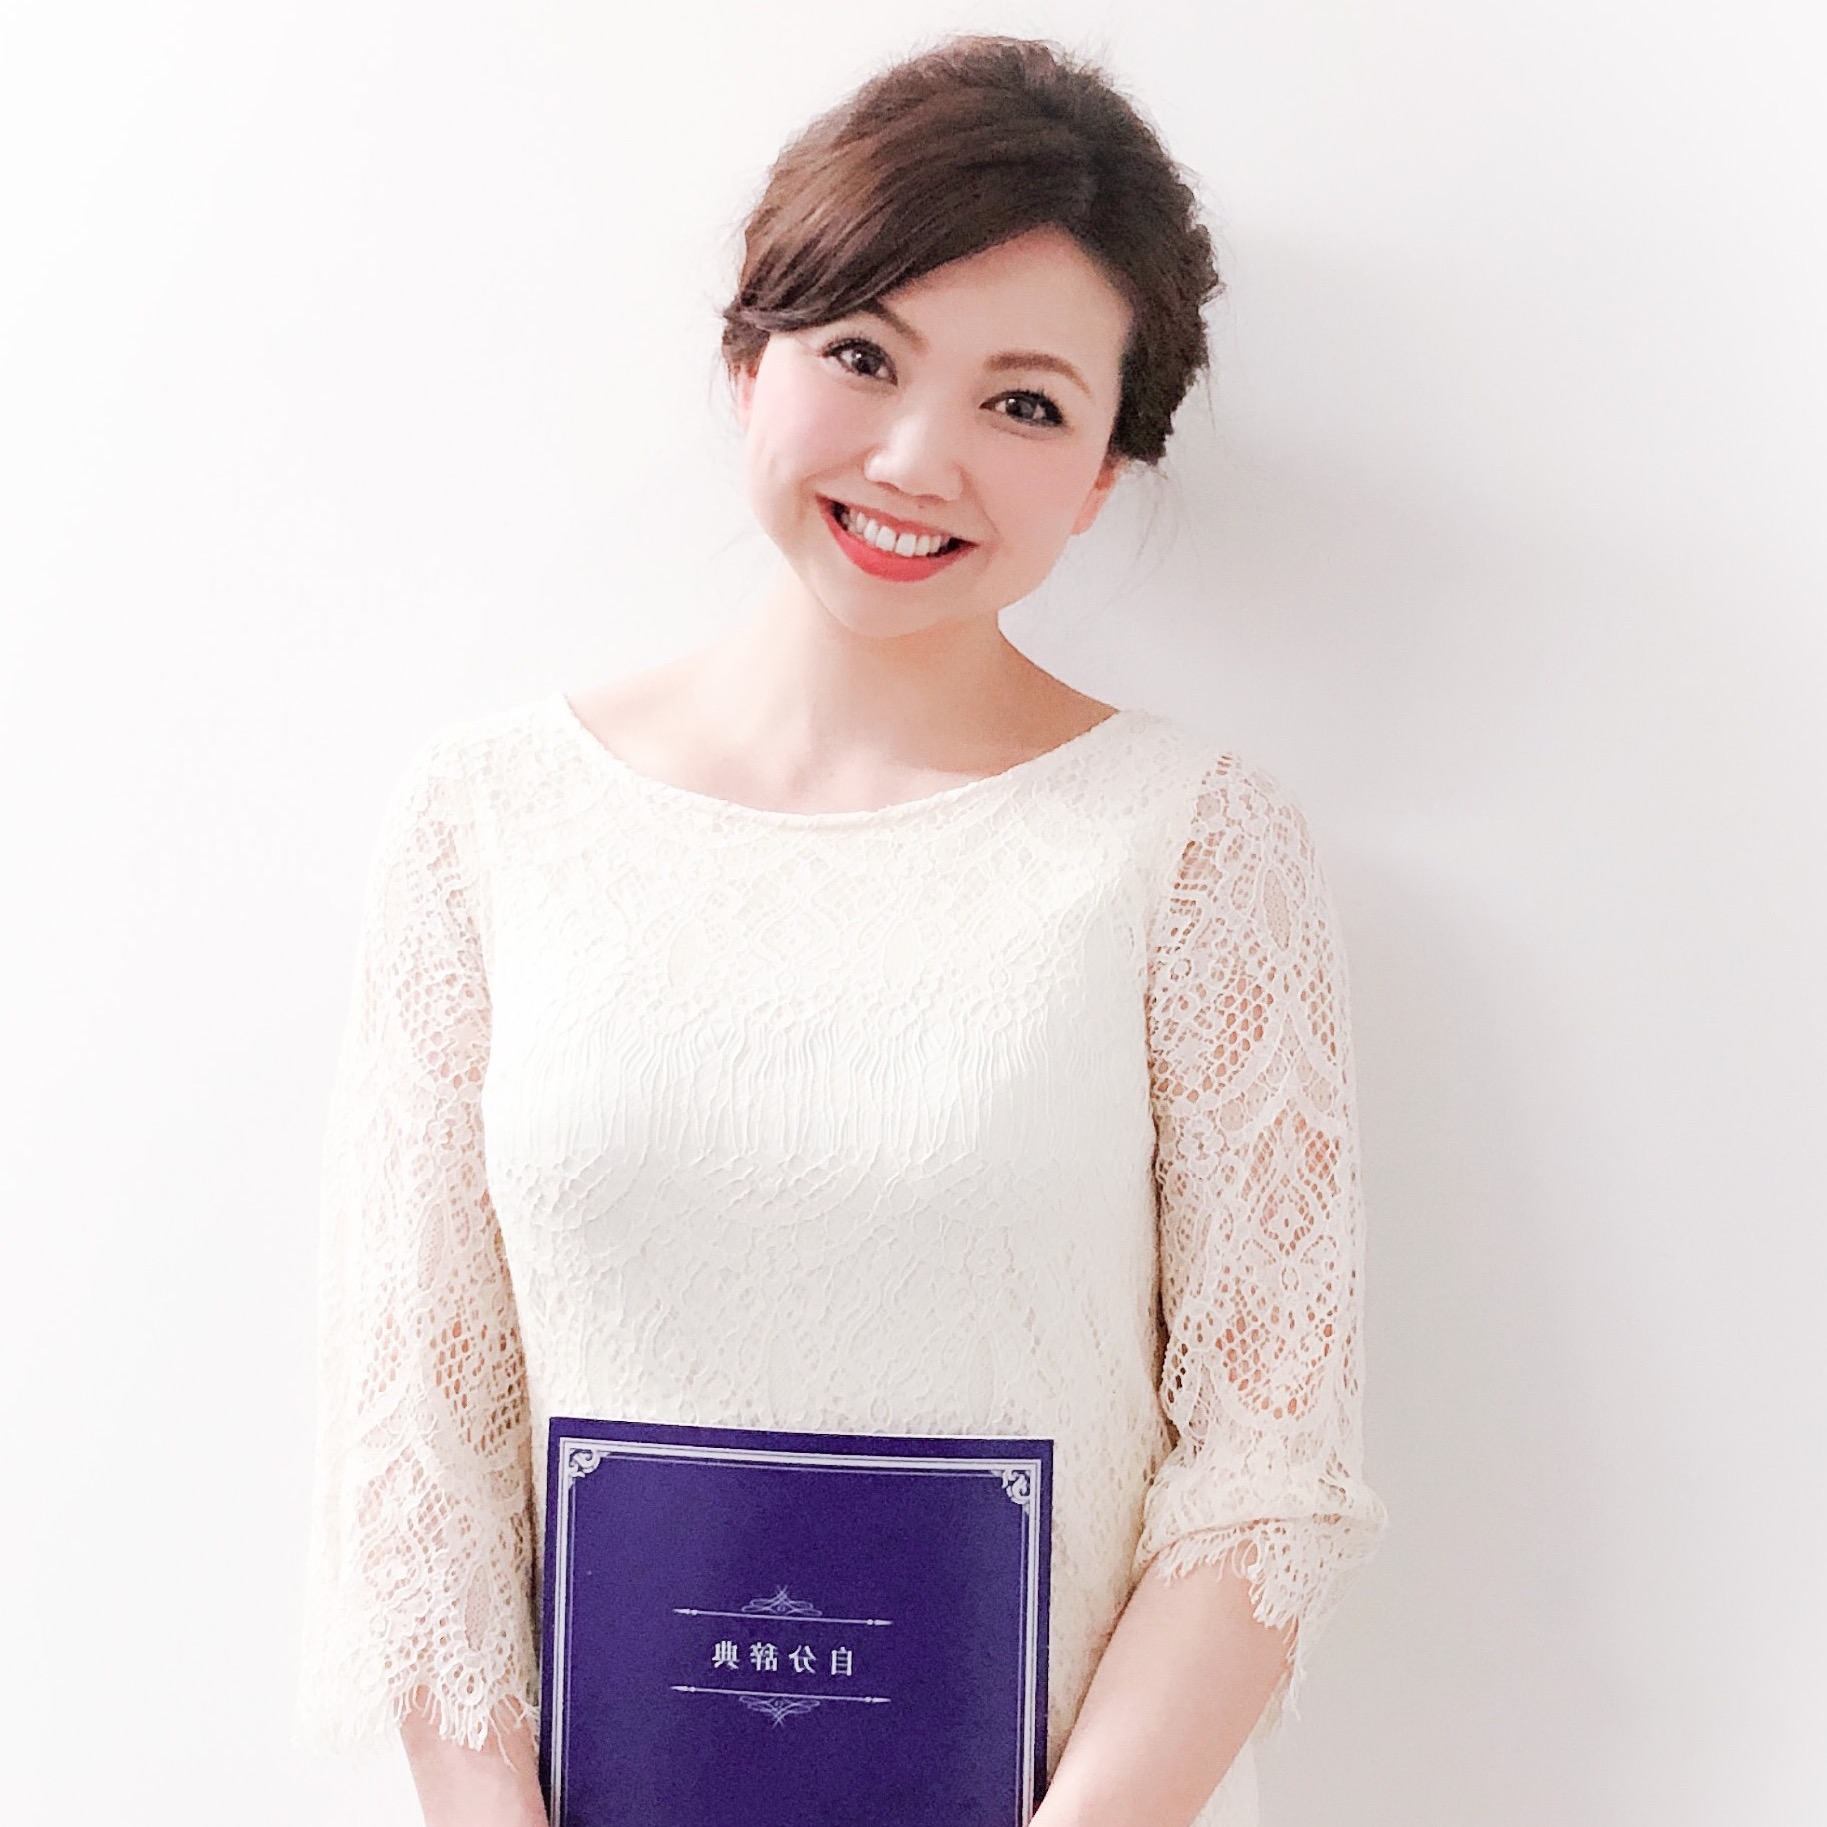 @matsumoto.maii Profile Image | Linktree